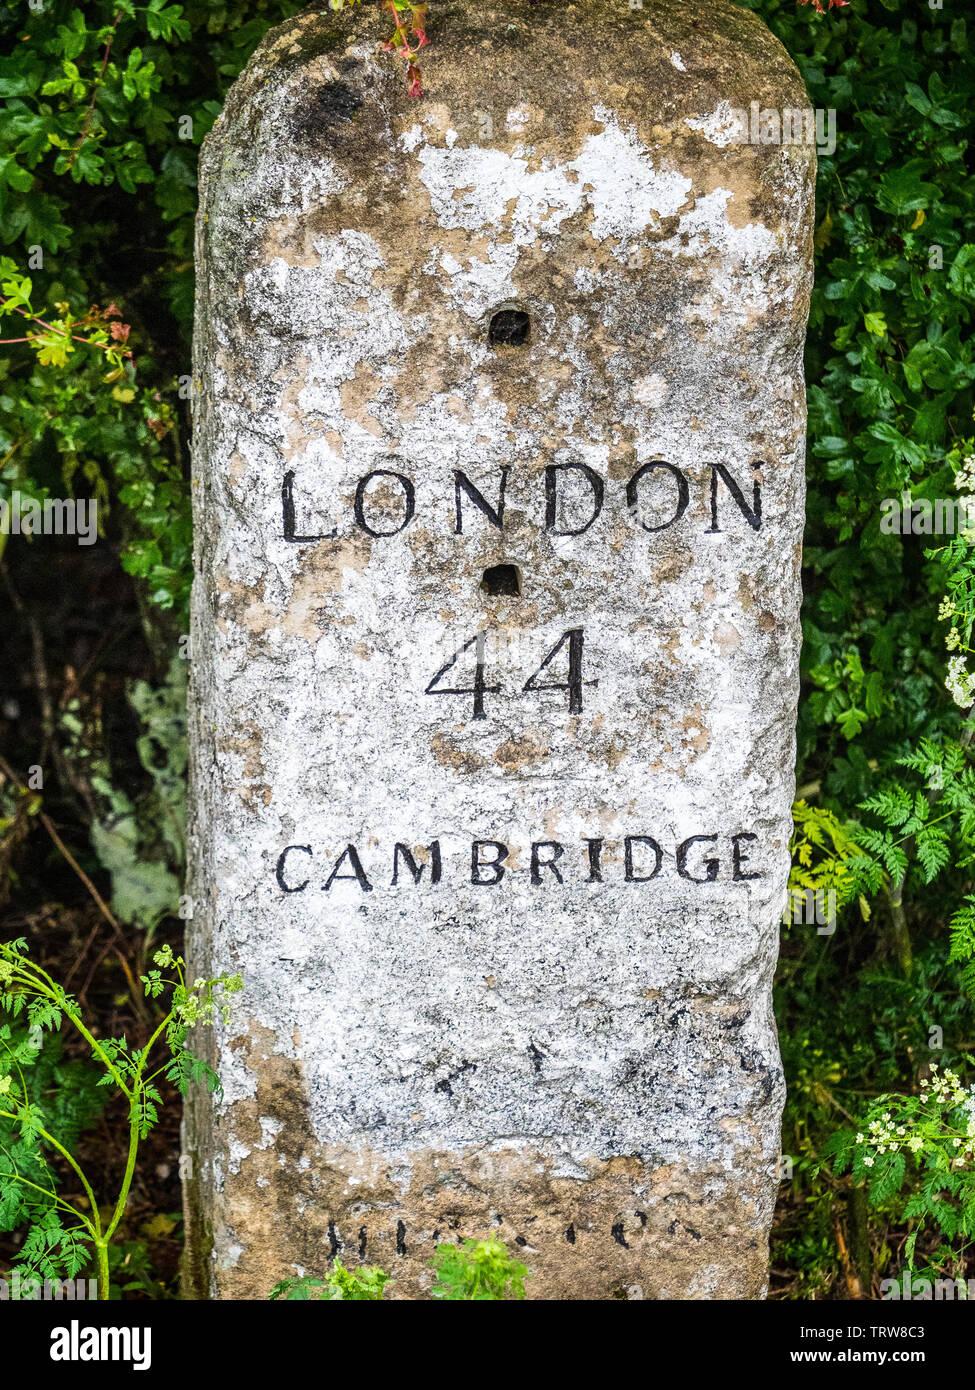 London to Cambridge Milestone, near Cambridge UK - Stock Image